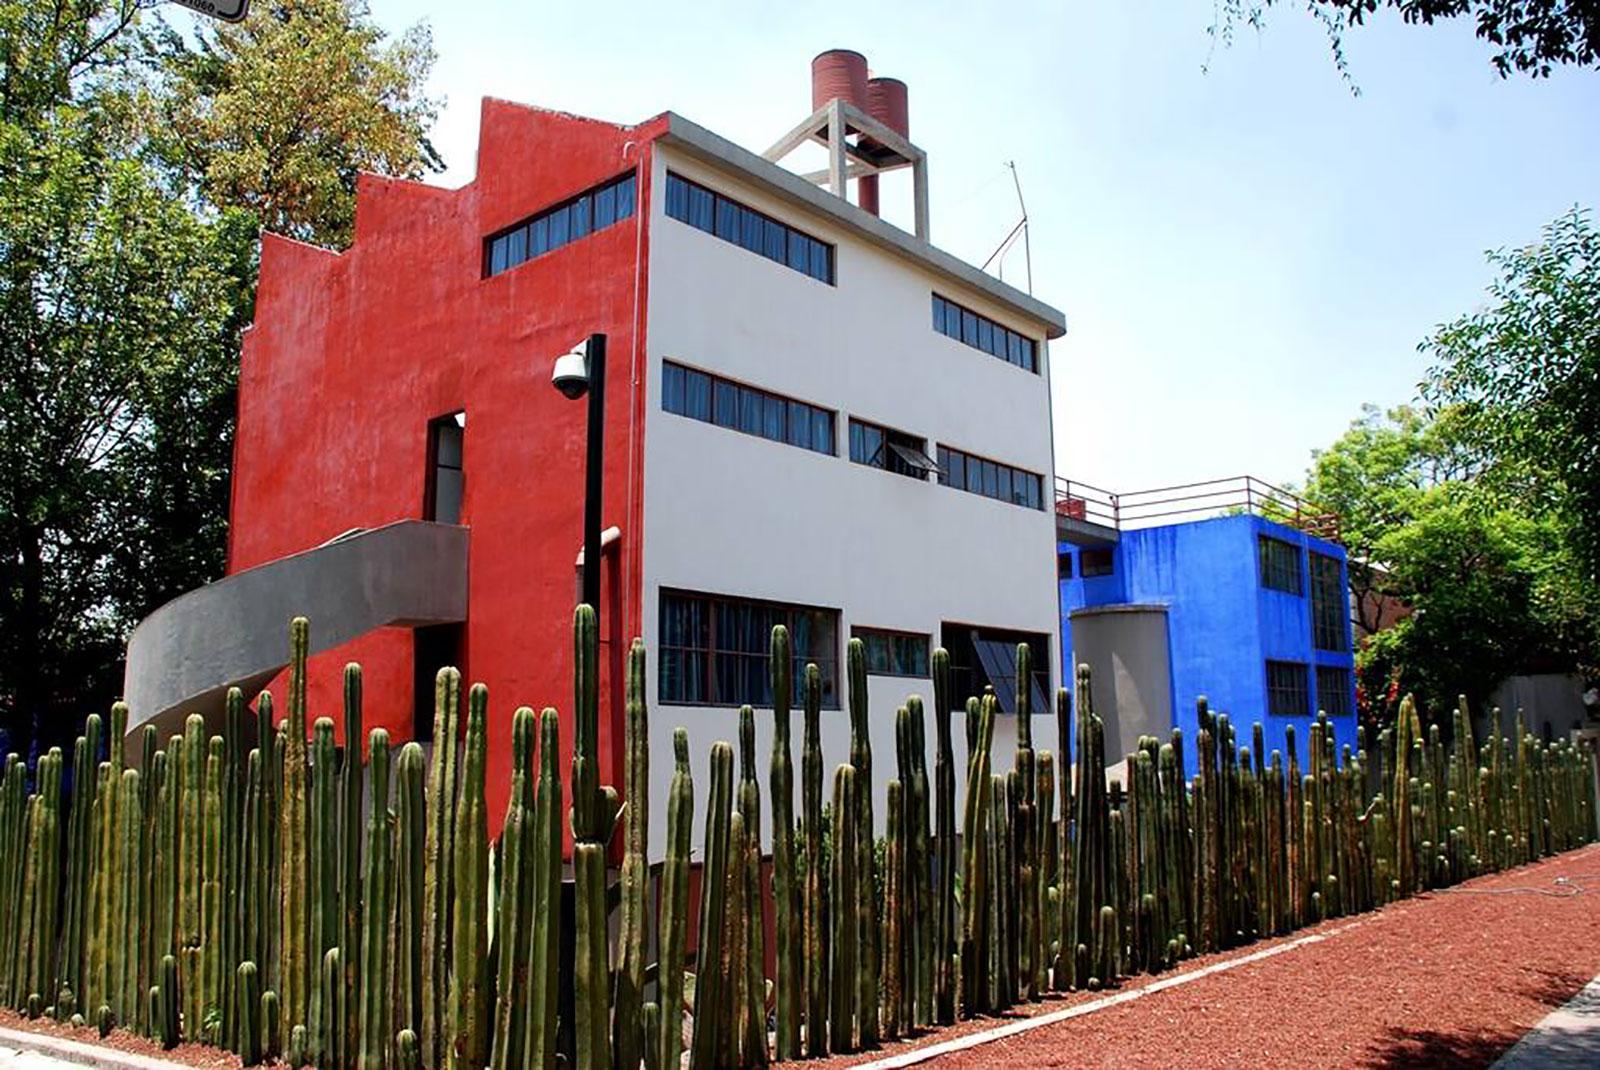 Studio houses of Diego Rivera and Frida Kahlo.